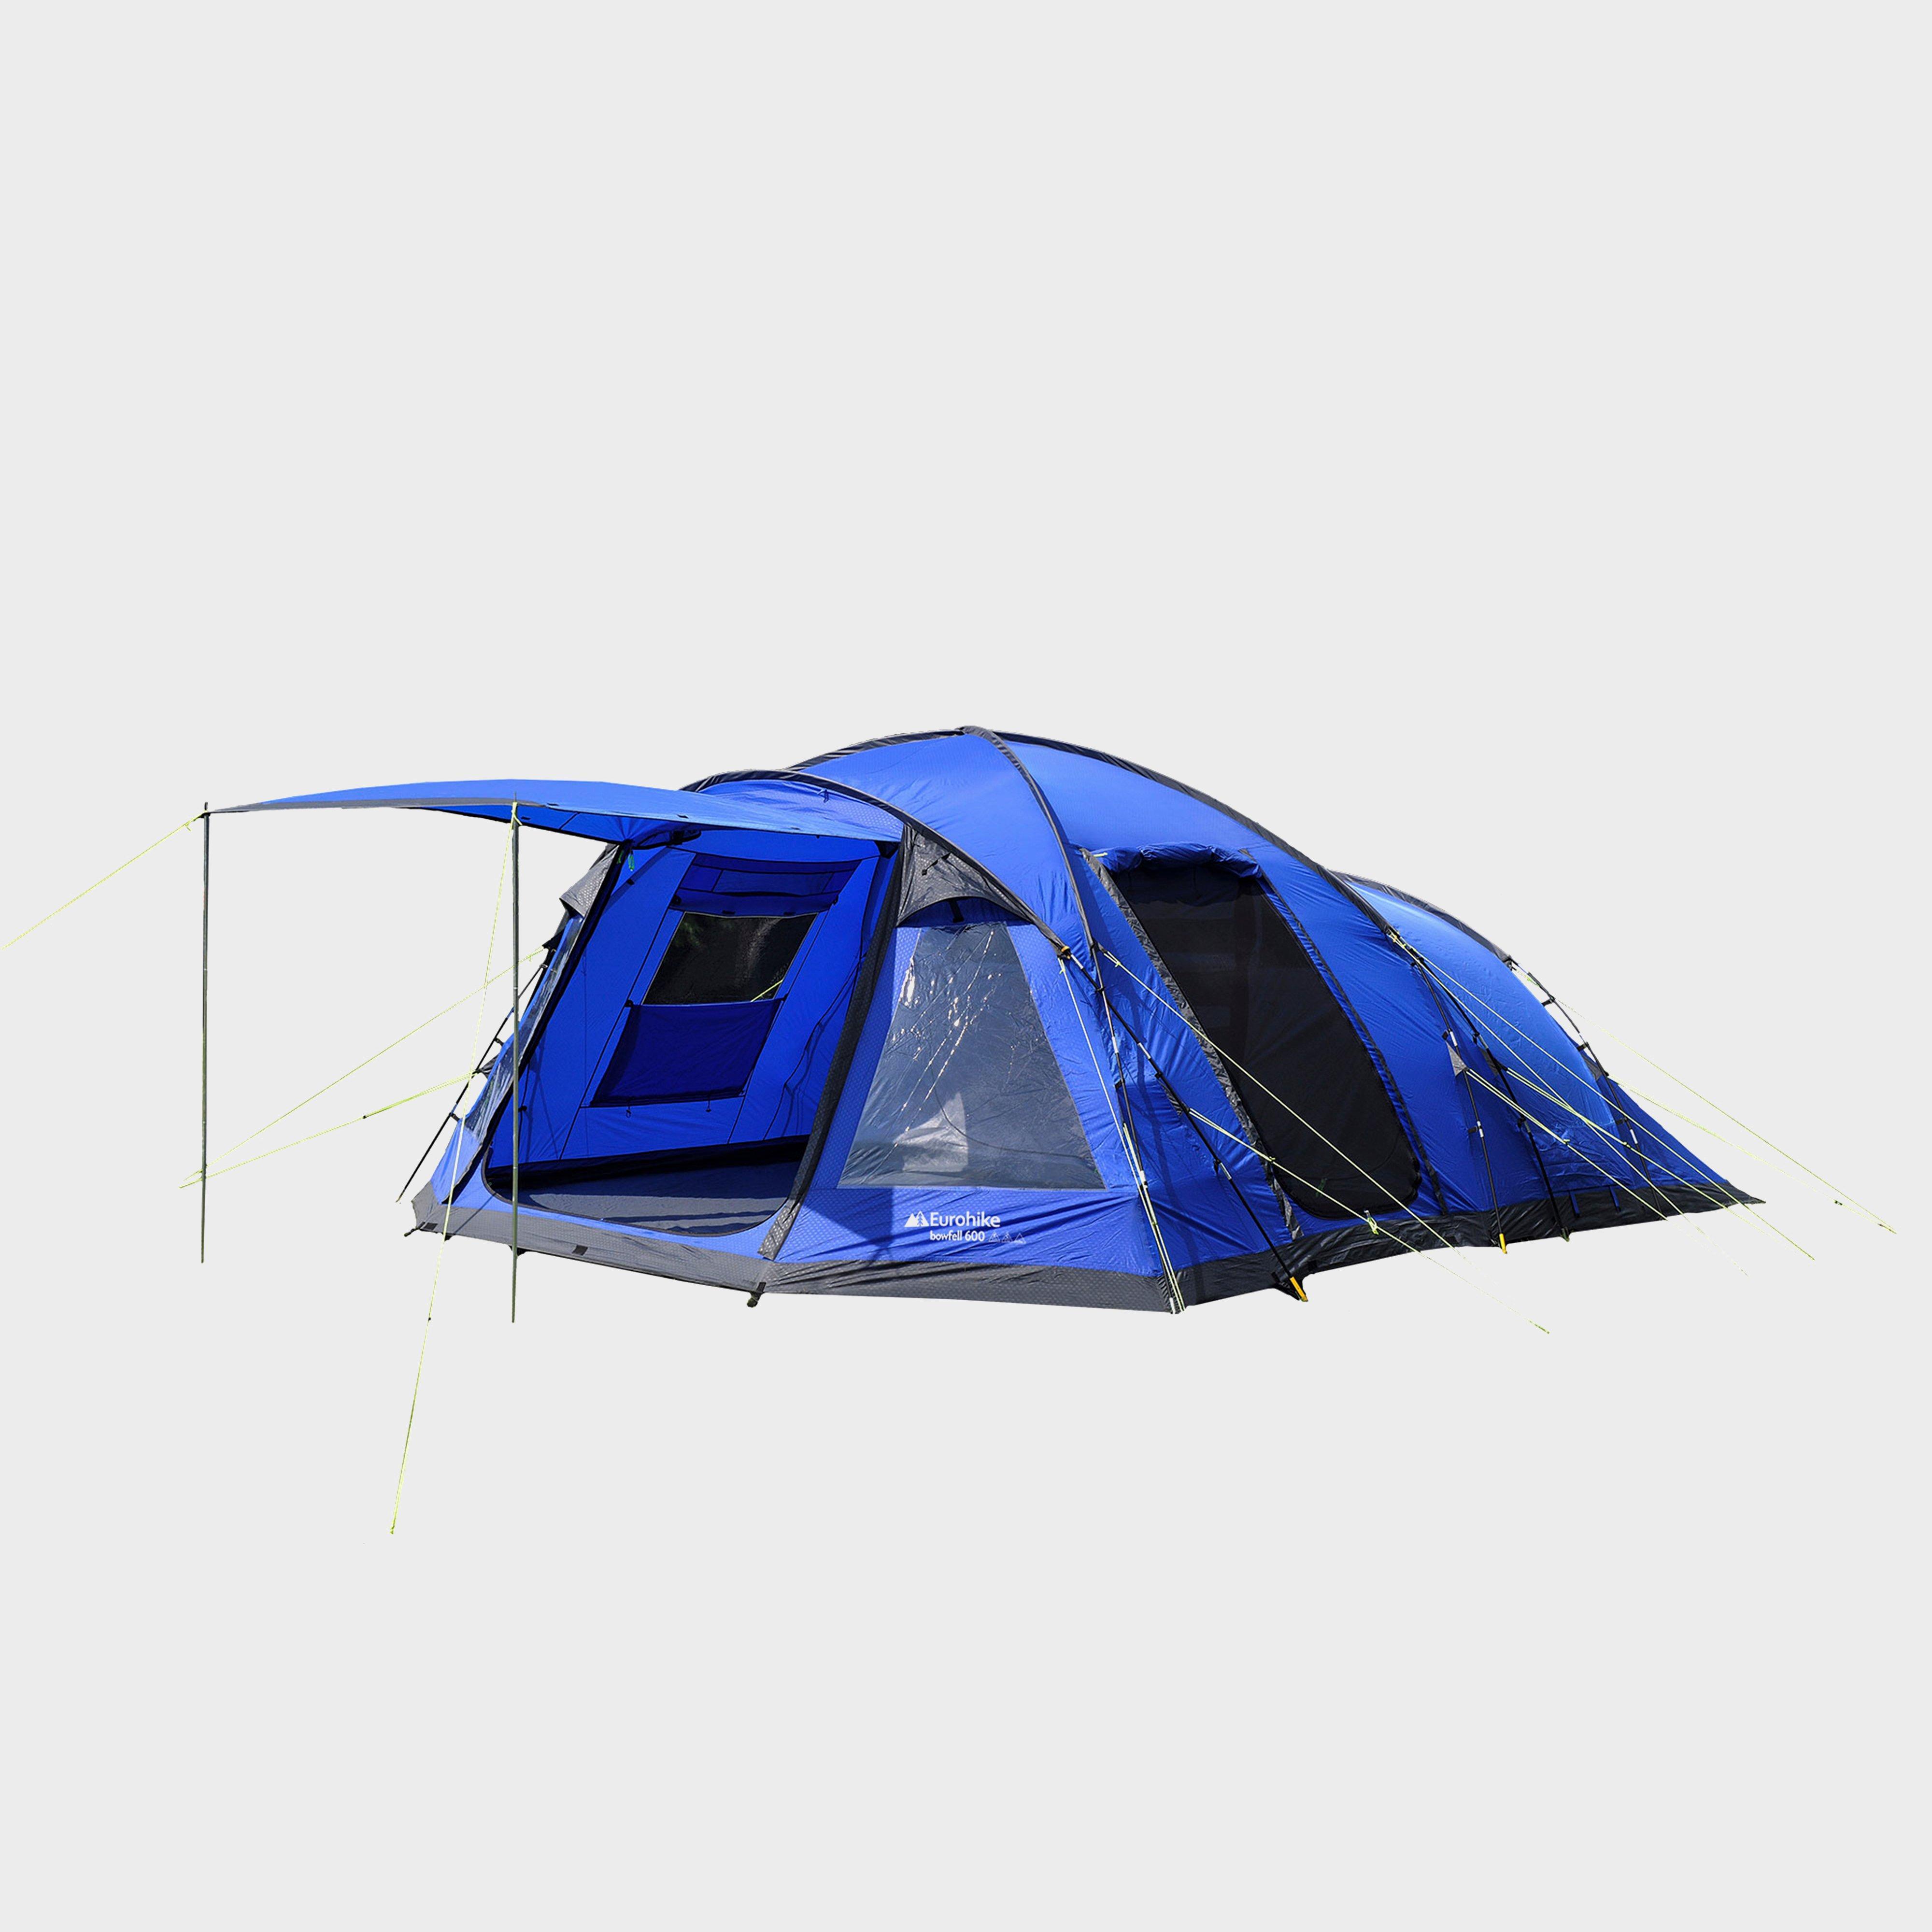 Eurohike Bowfell 600 6 Person Tent, Blue